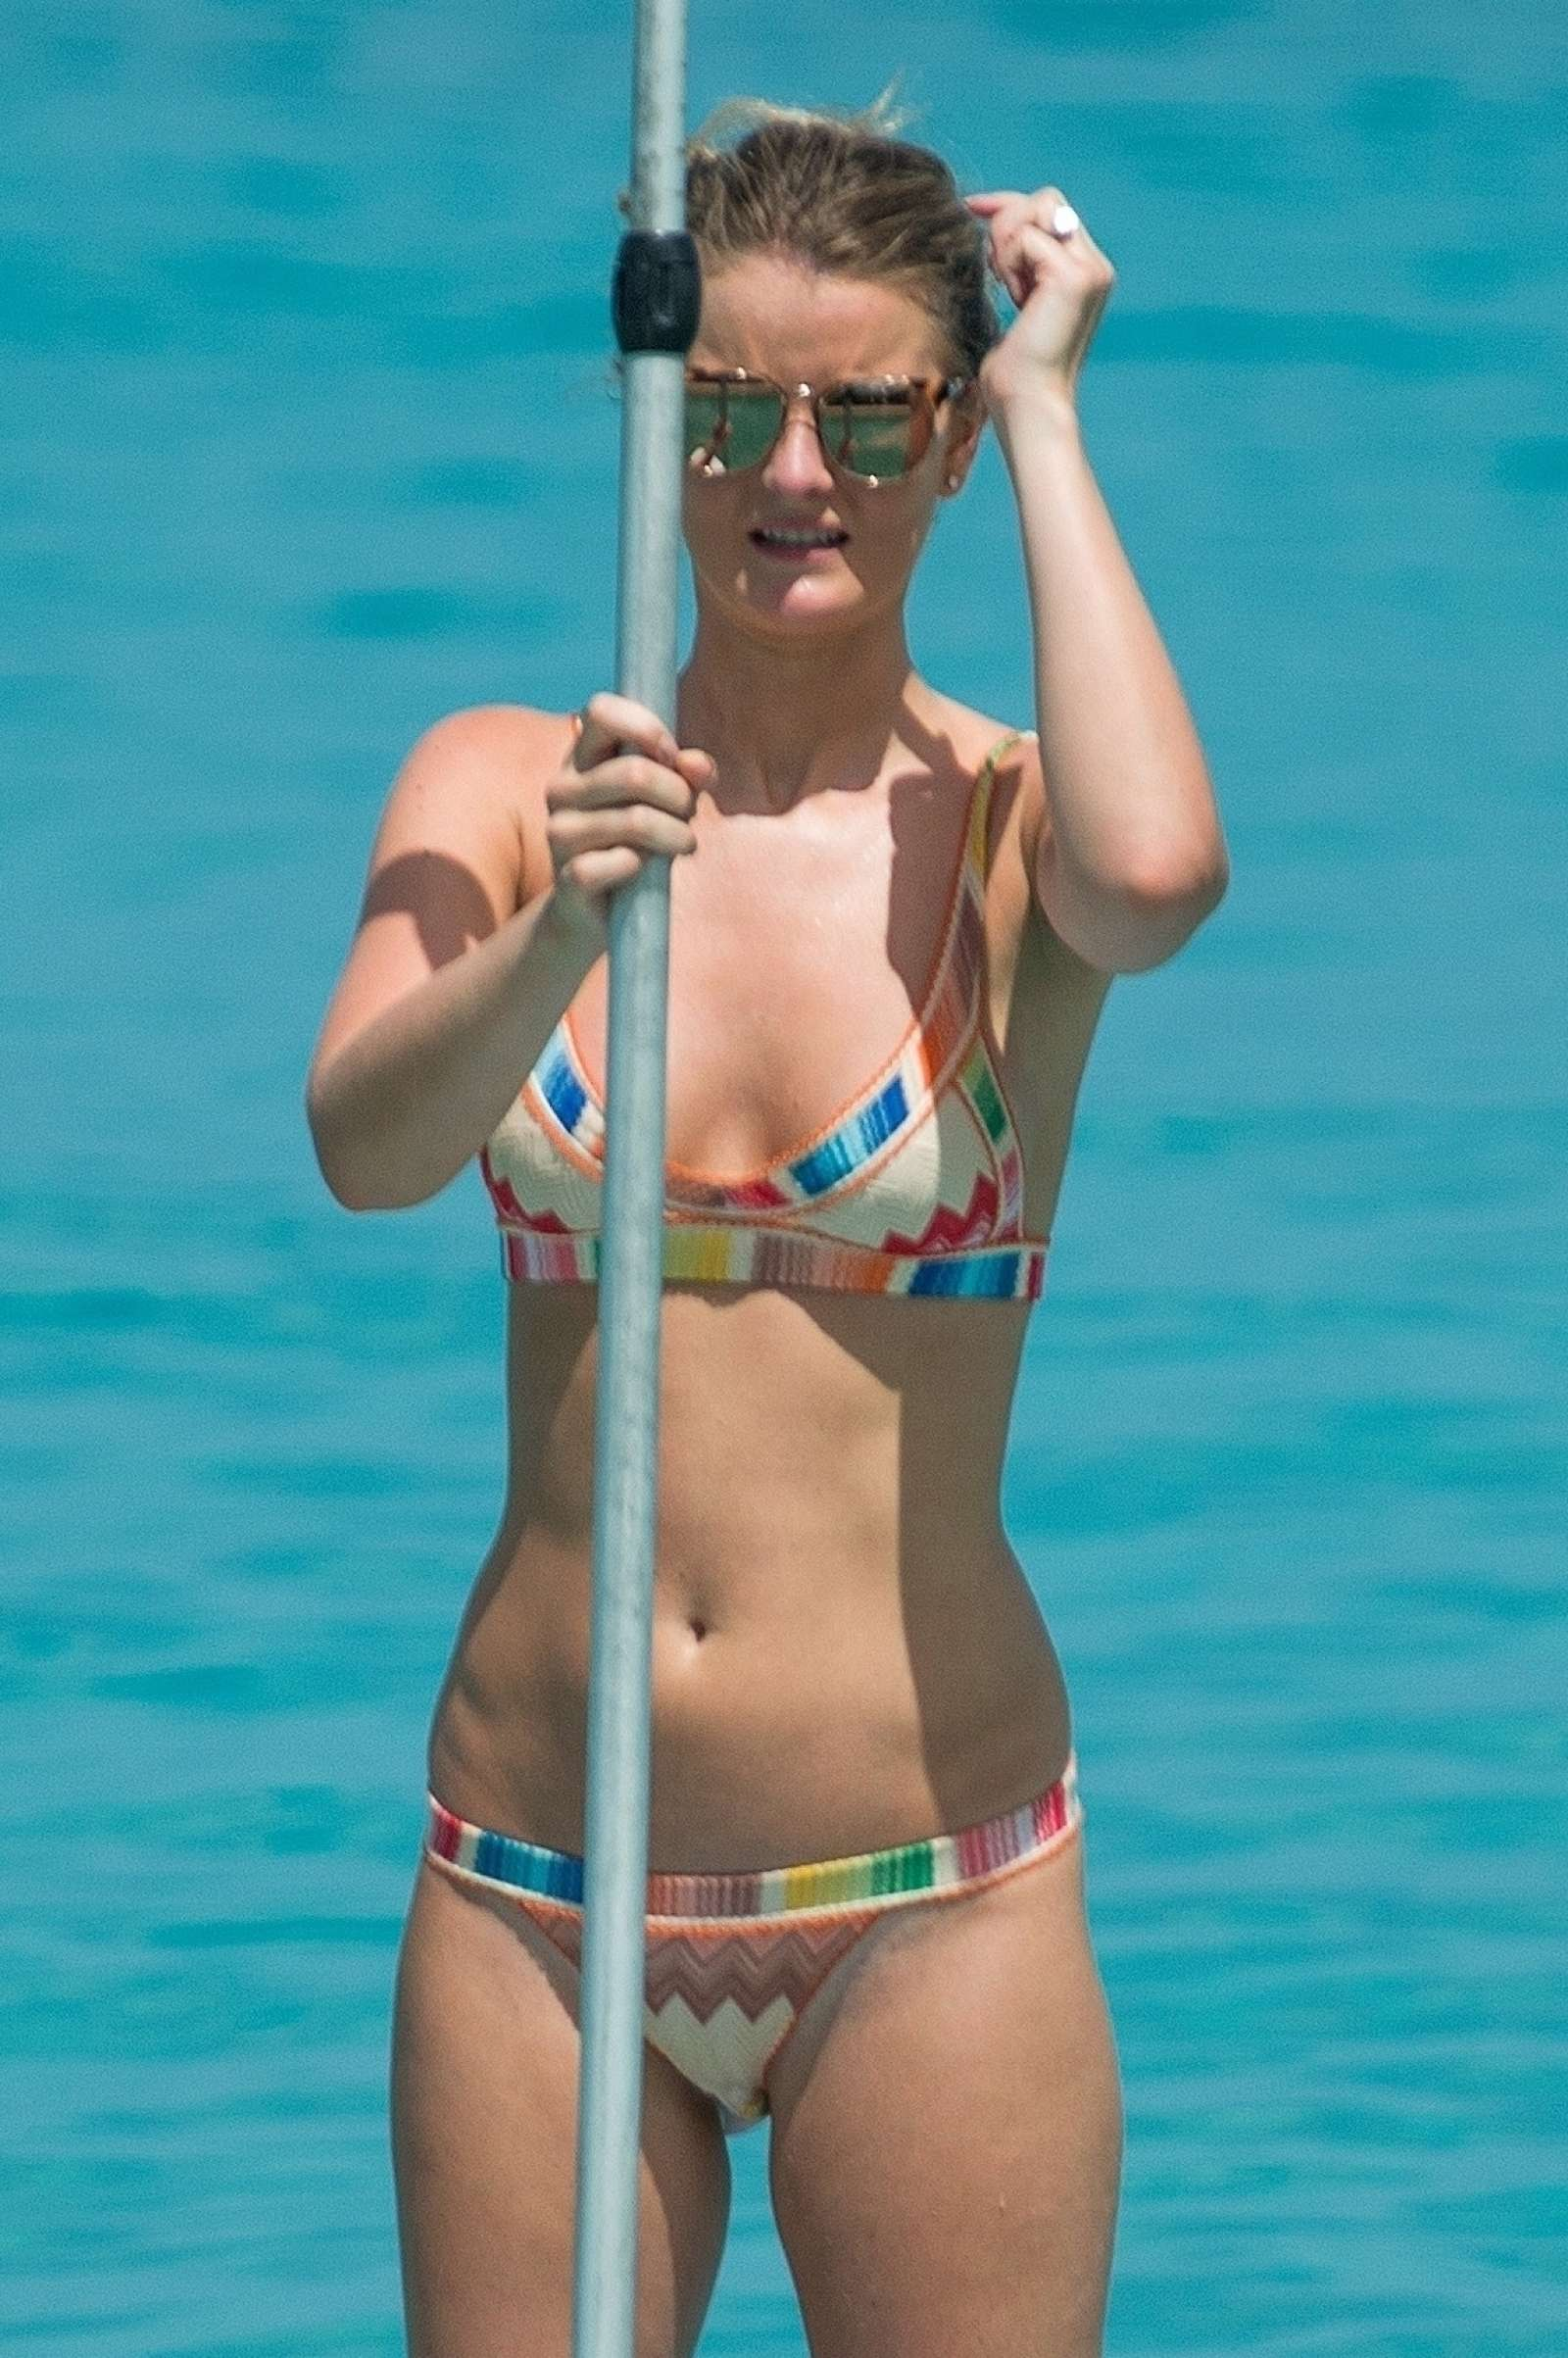 Bikini Zoe Salmon nude photos 2019